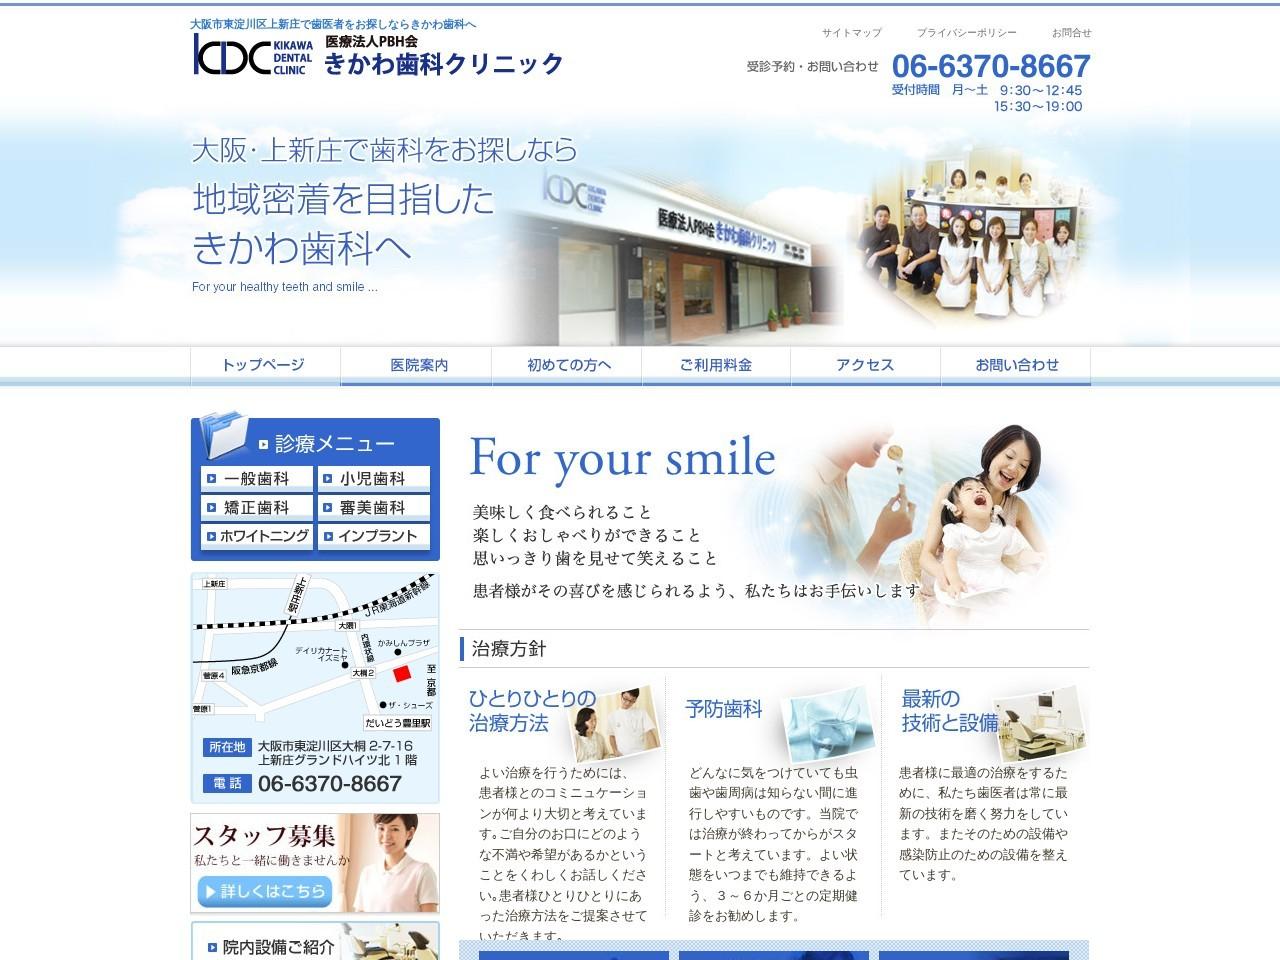 医療法人PBH会  きかわ歯科医院 (大阪府大阪市東淀川区)